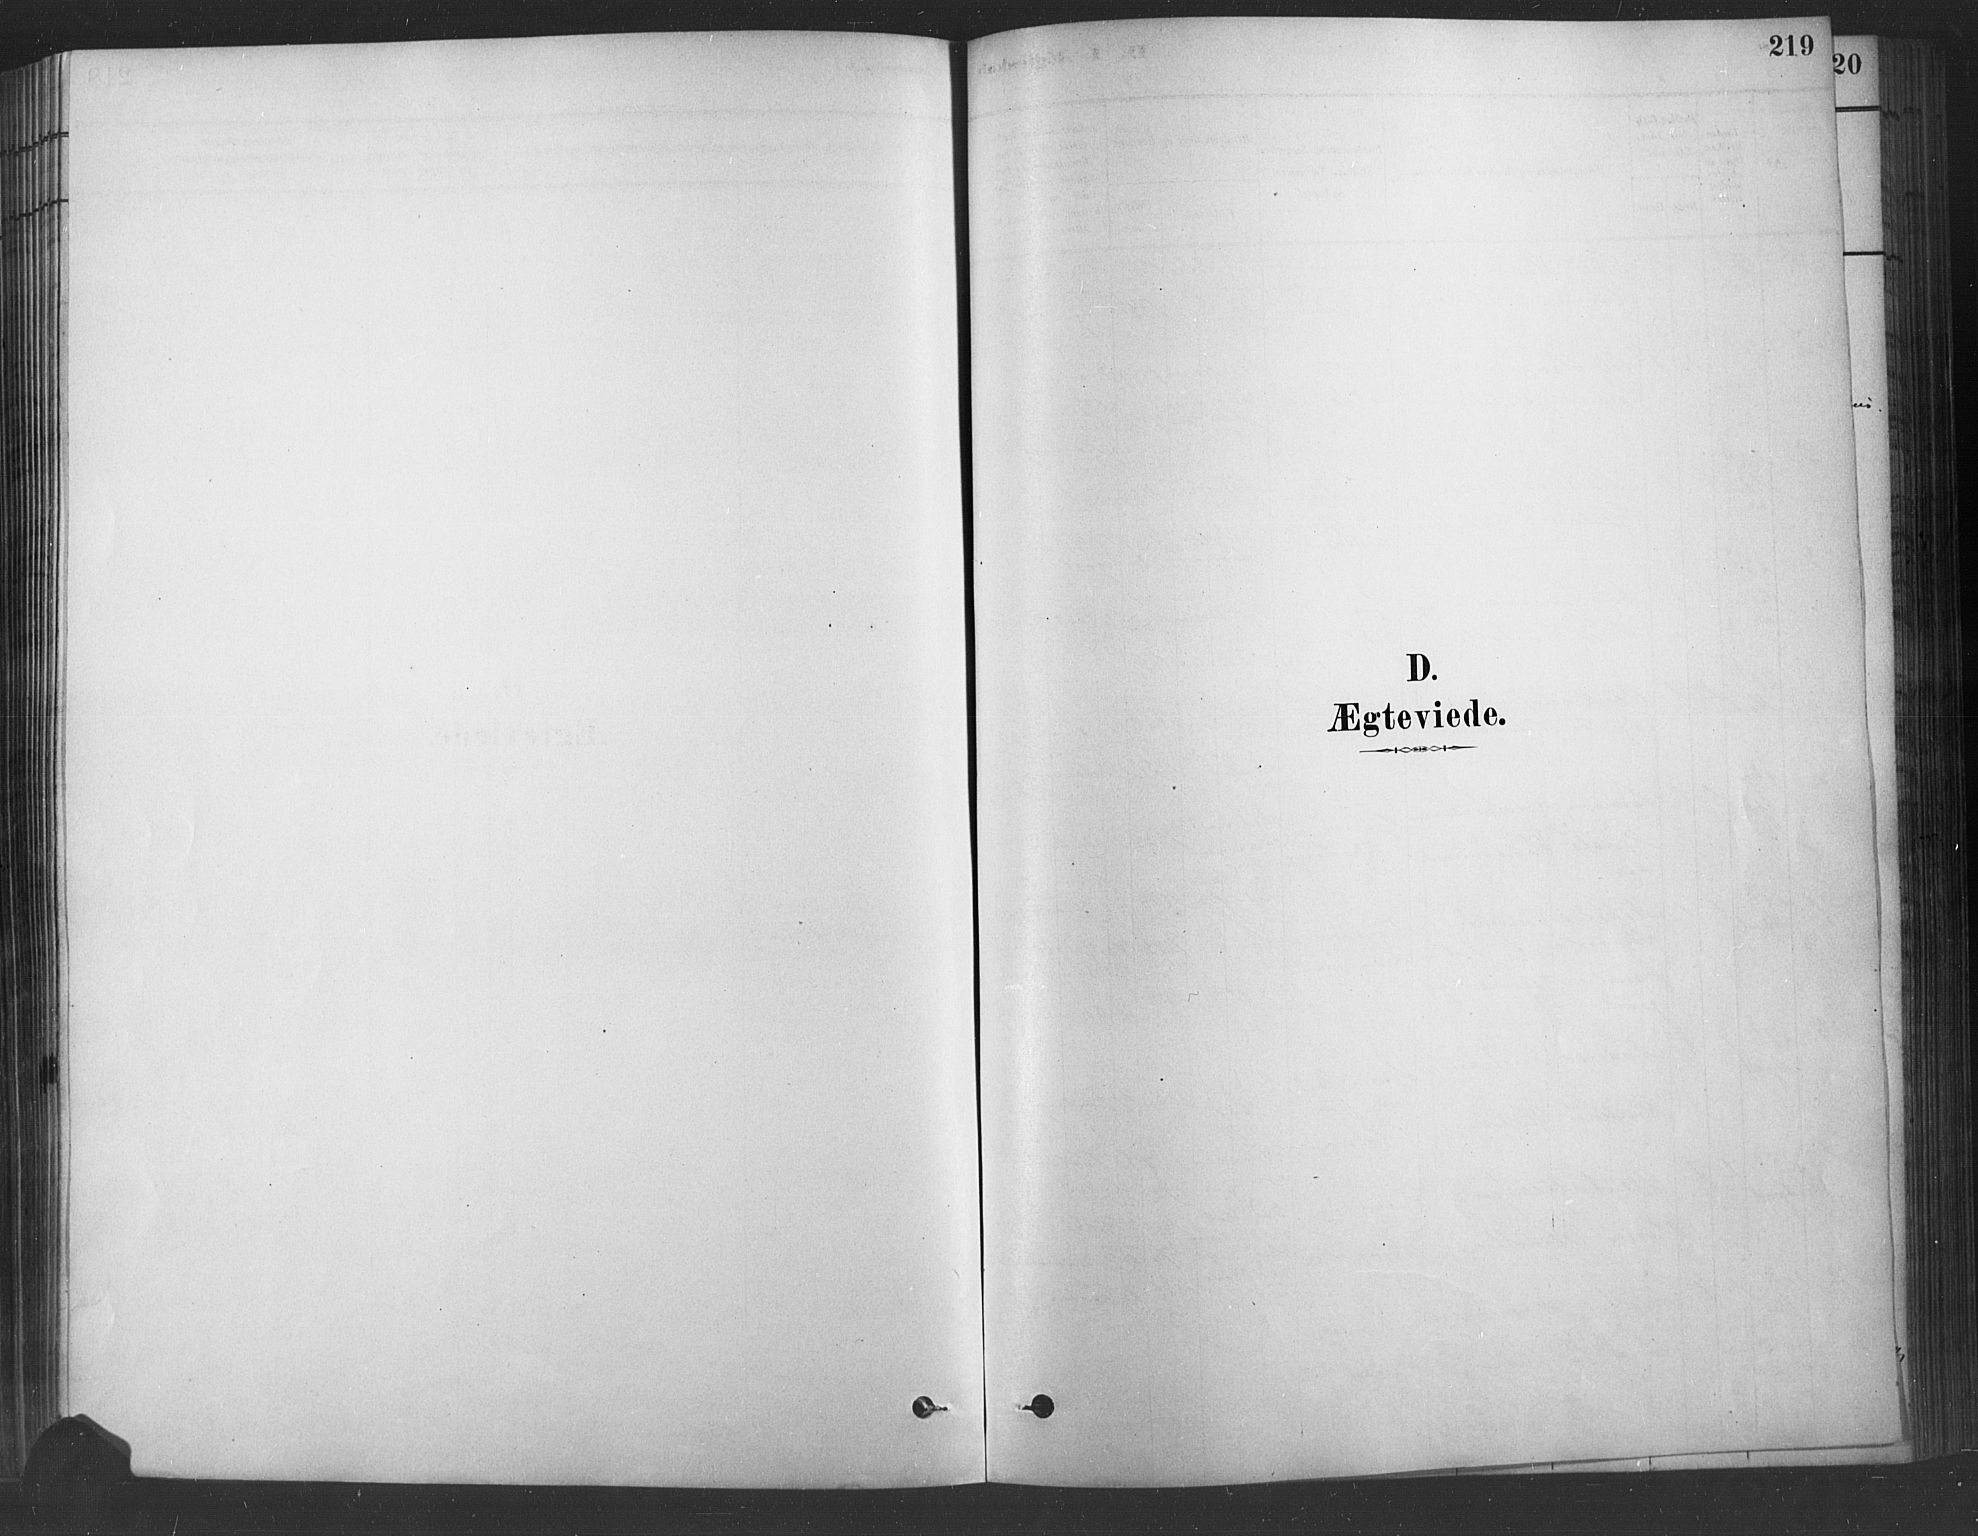 SAH, Fåberg prestekontor, H/Ha/Haa/L0009: Parish register (official) no. 9, 1879-1898, p. 219